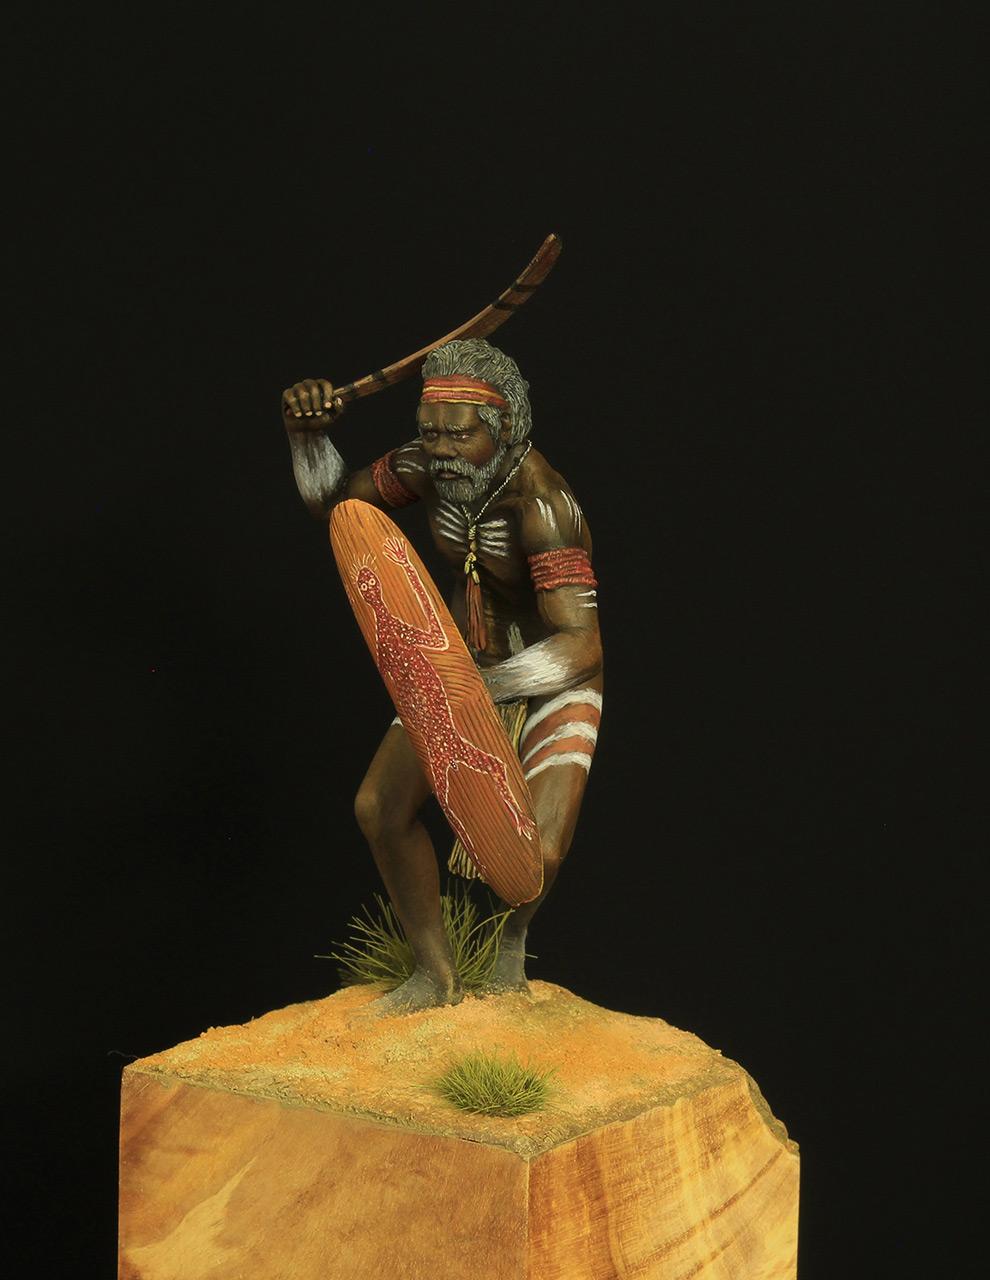 Figures: Australian aborigine, photo #2